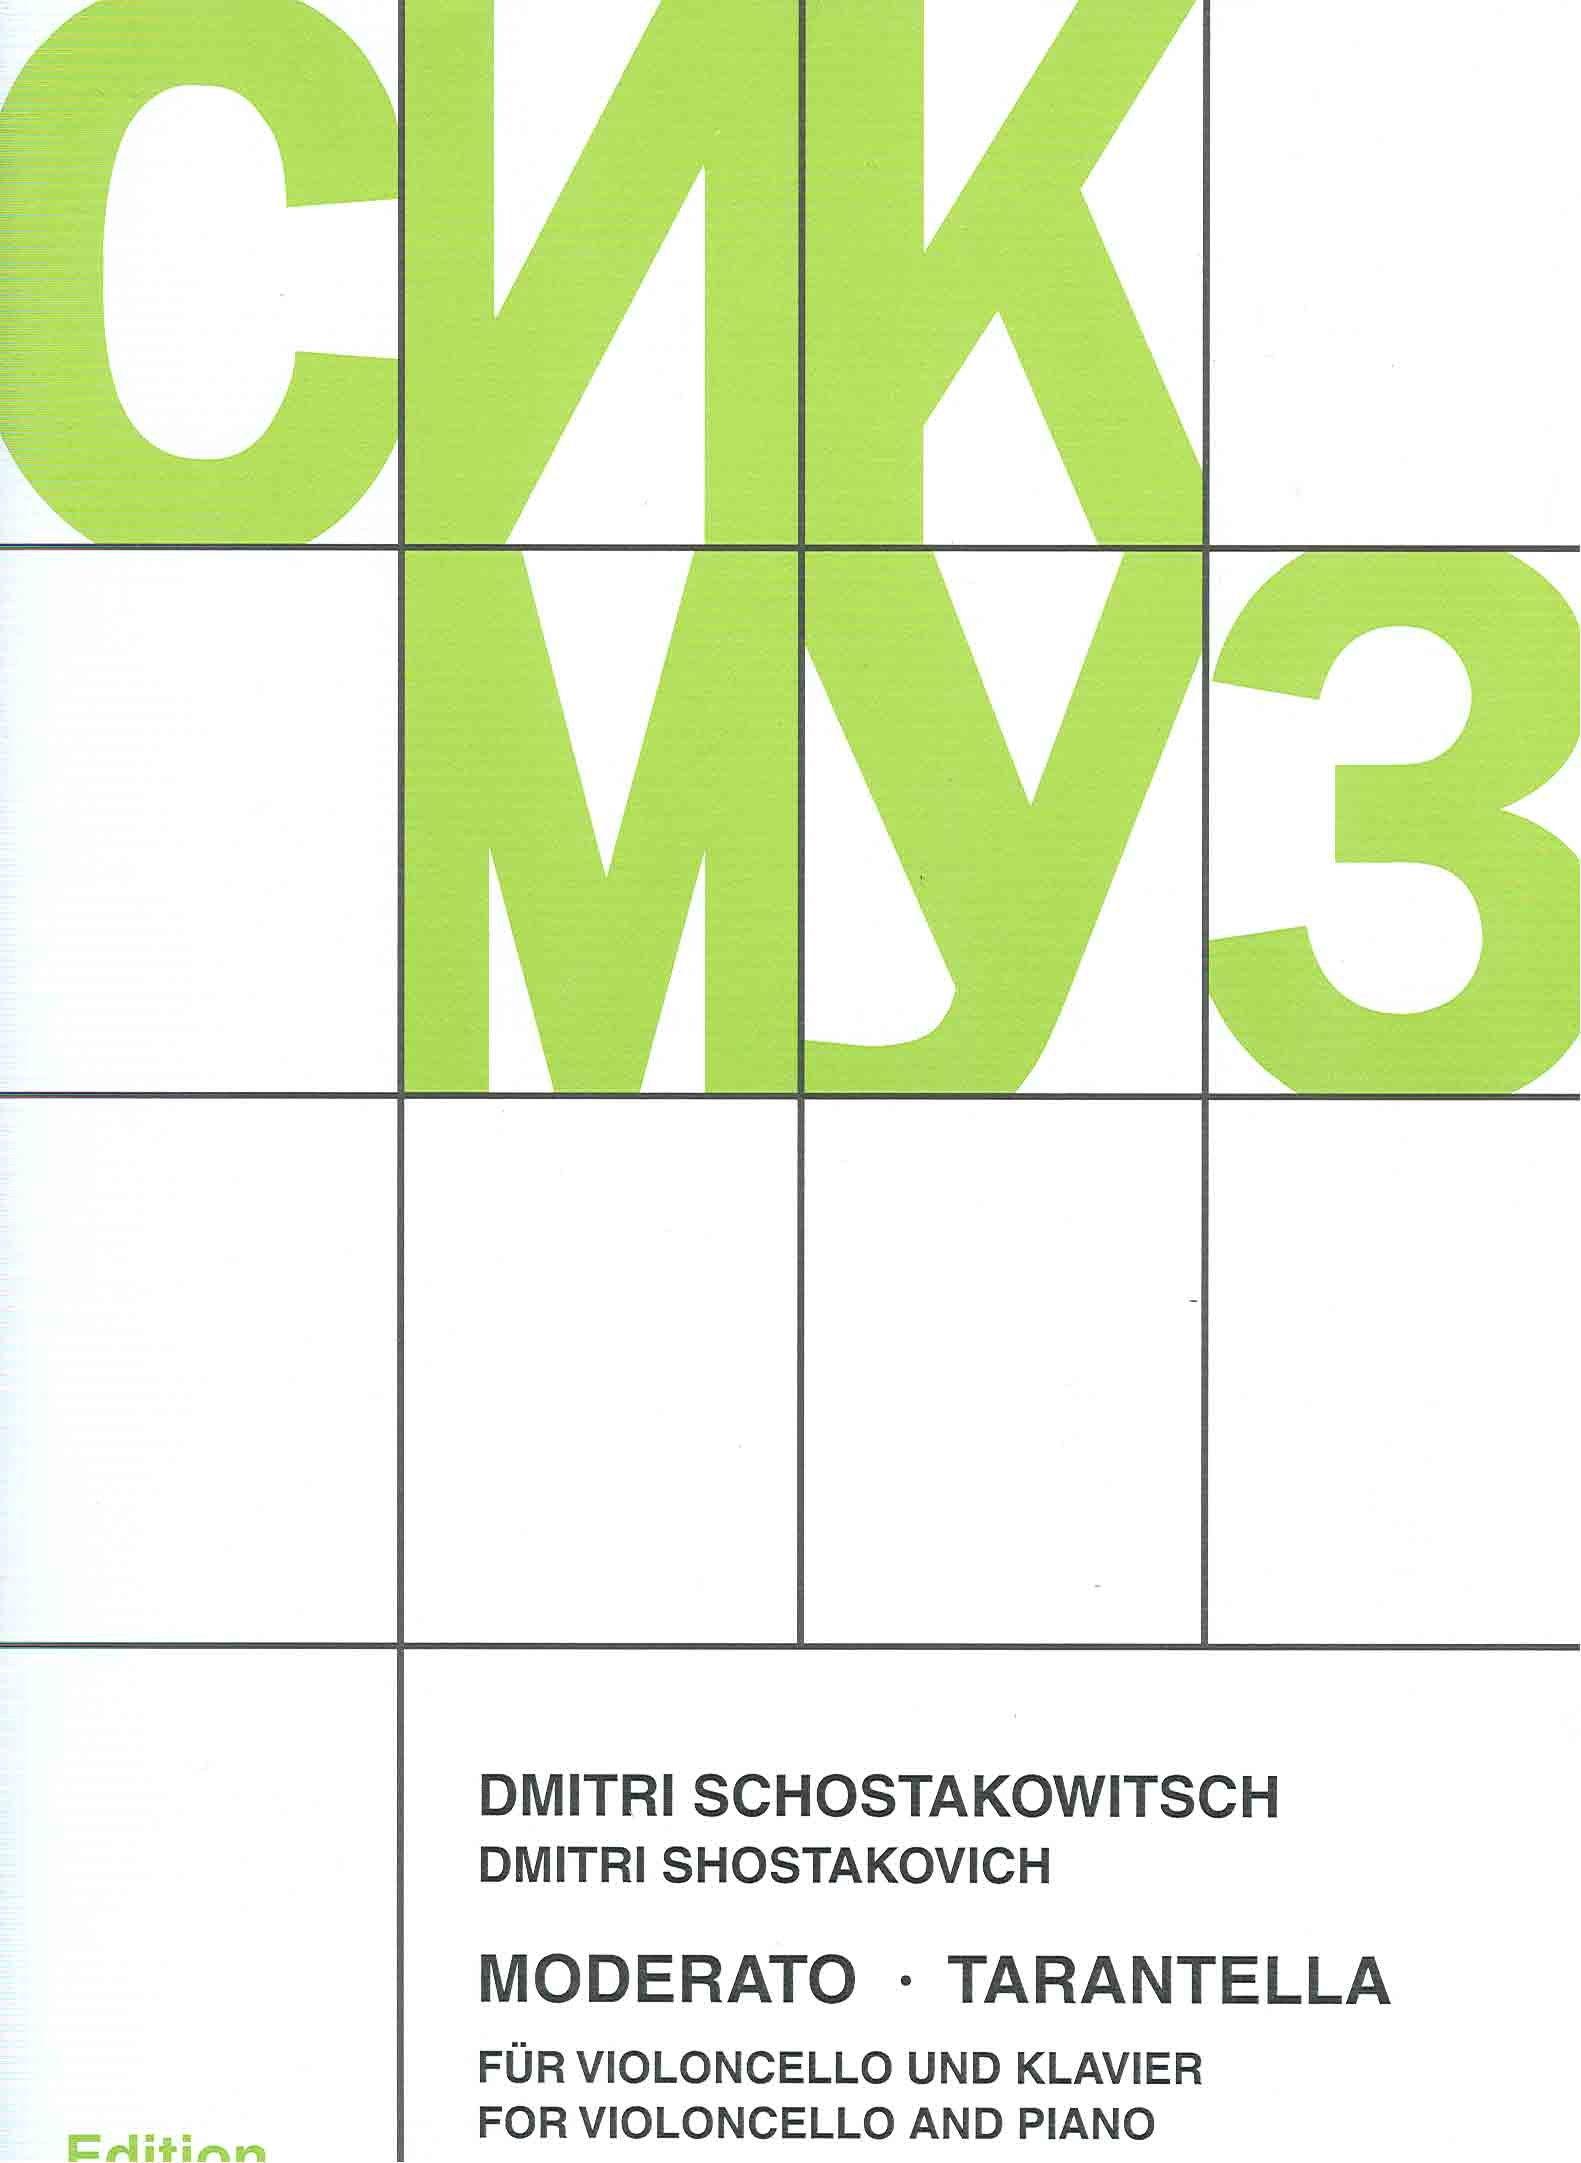 Shostakovich Moderato And Tarantella Dmitri Shostakovich